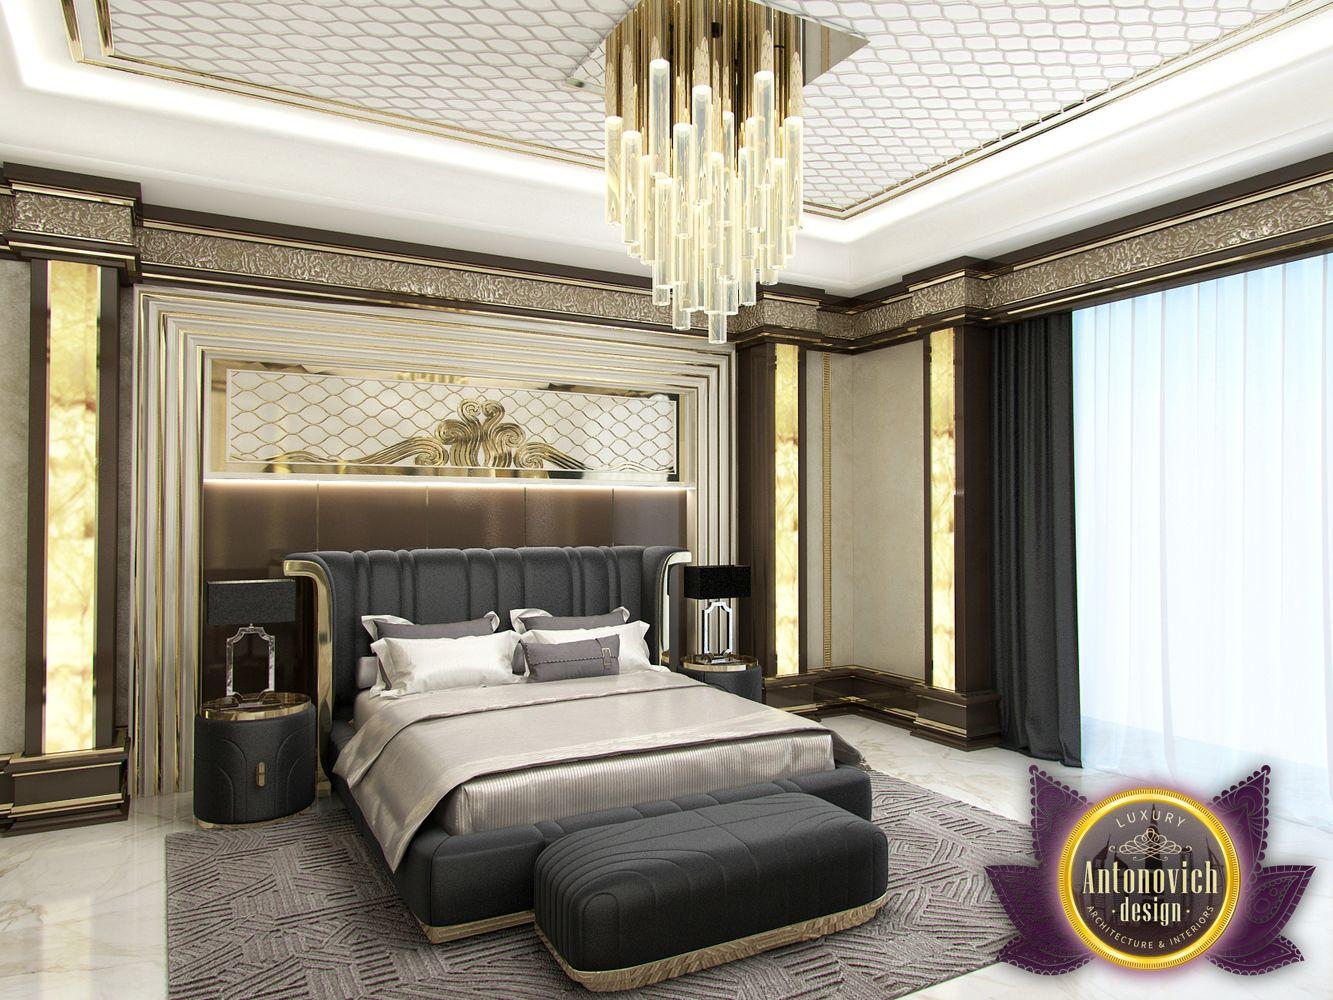 LUXURY ANTONOVICH DESIGN UAE: Master Bedroom in Modern ...